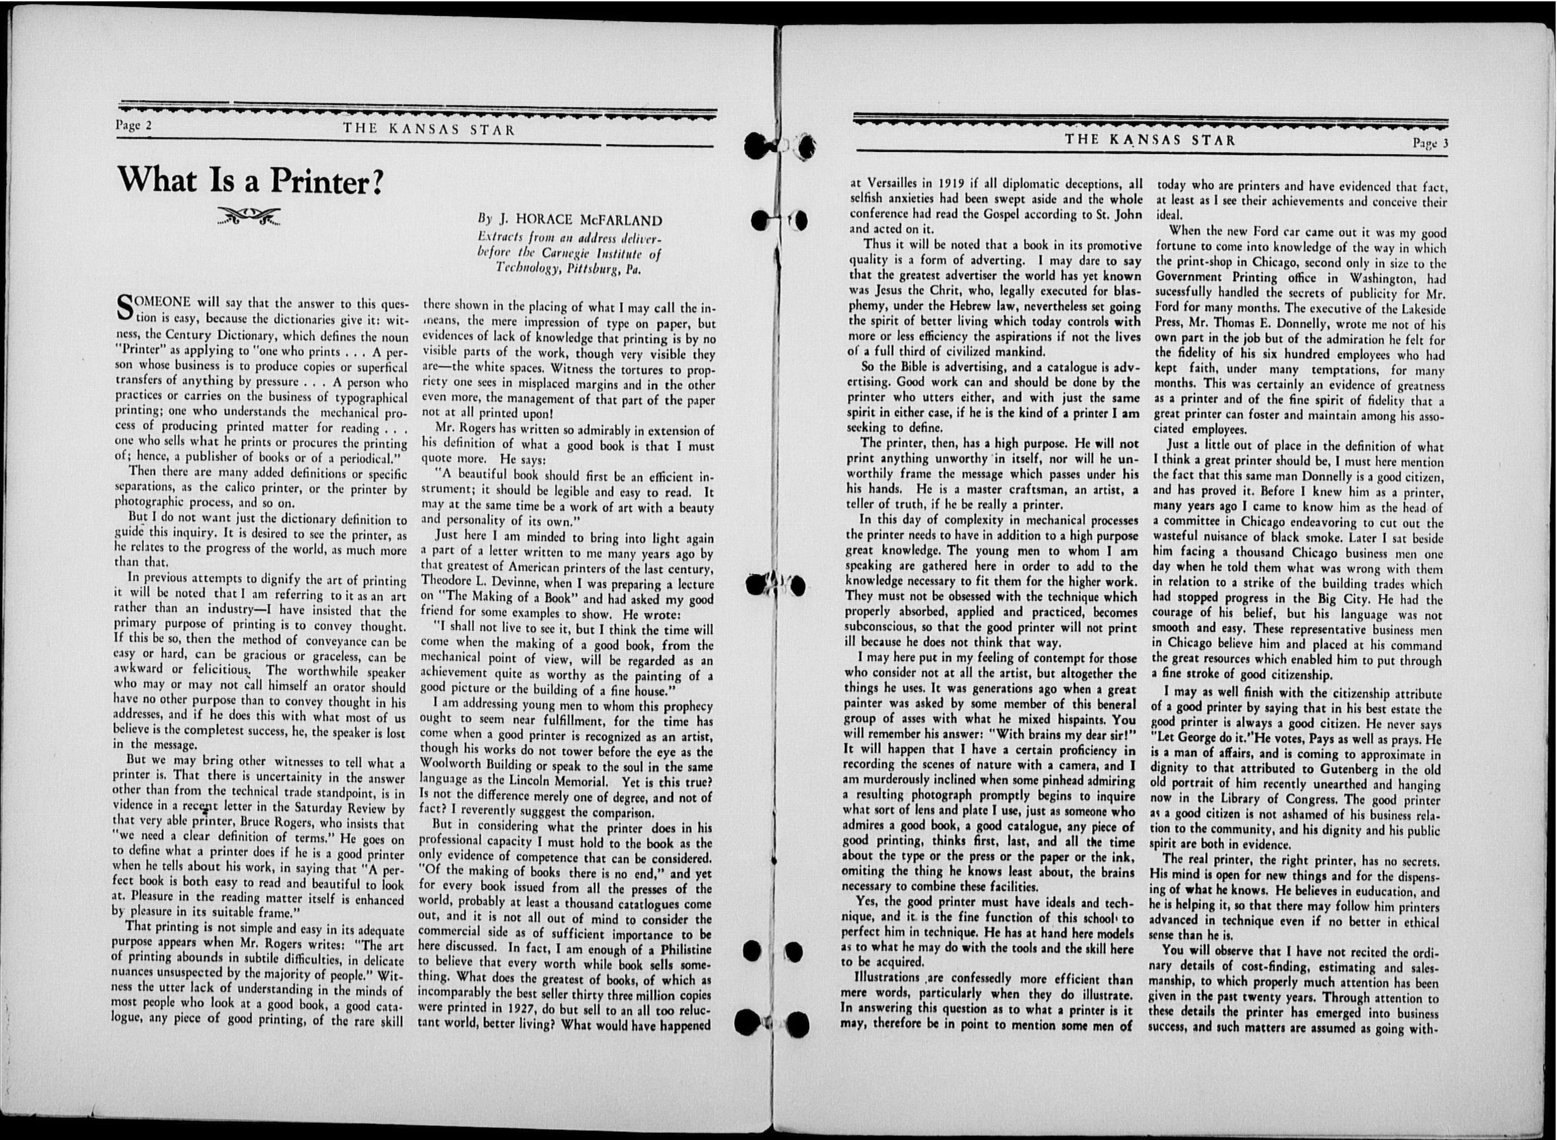 The Kansas Star, volume 52, number 1 - 2-3